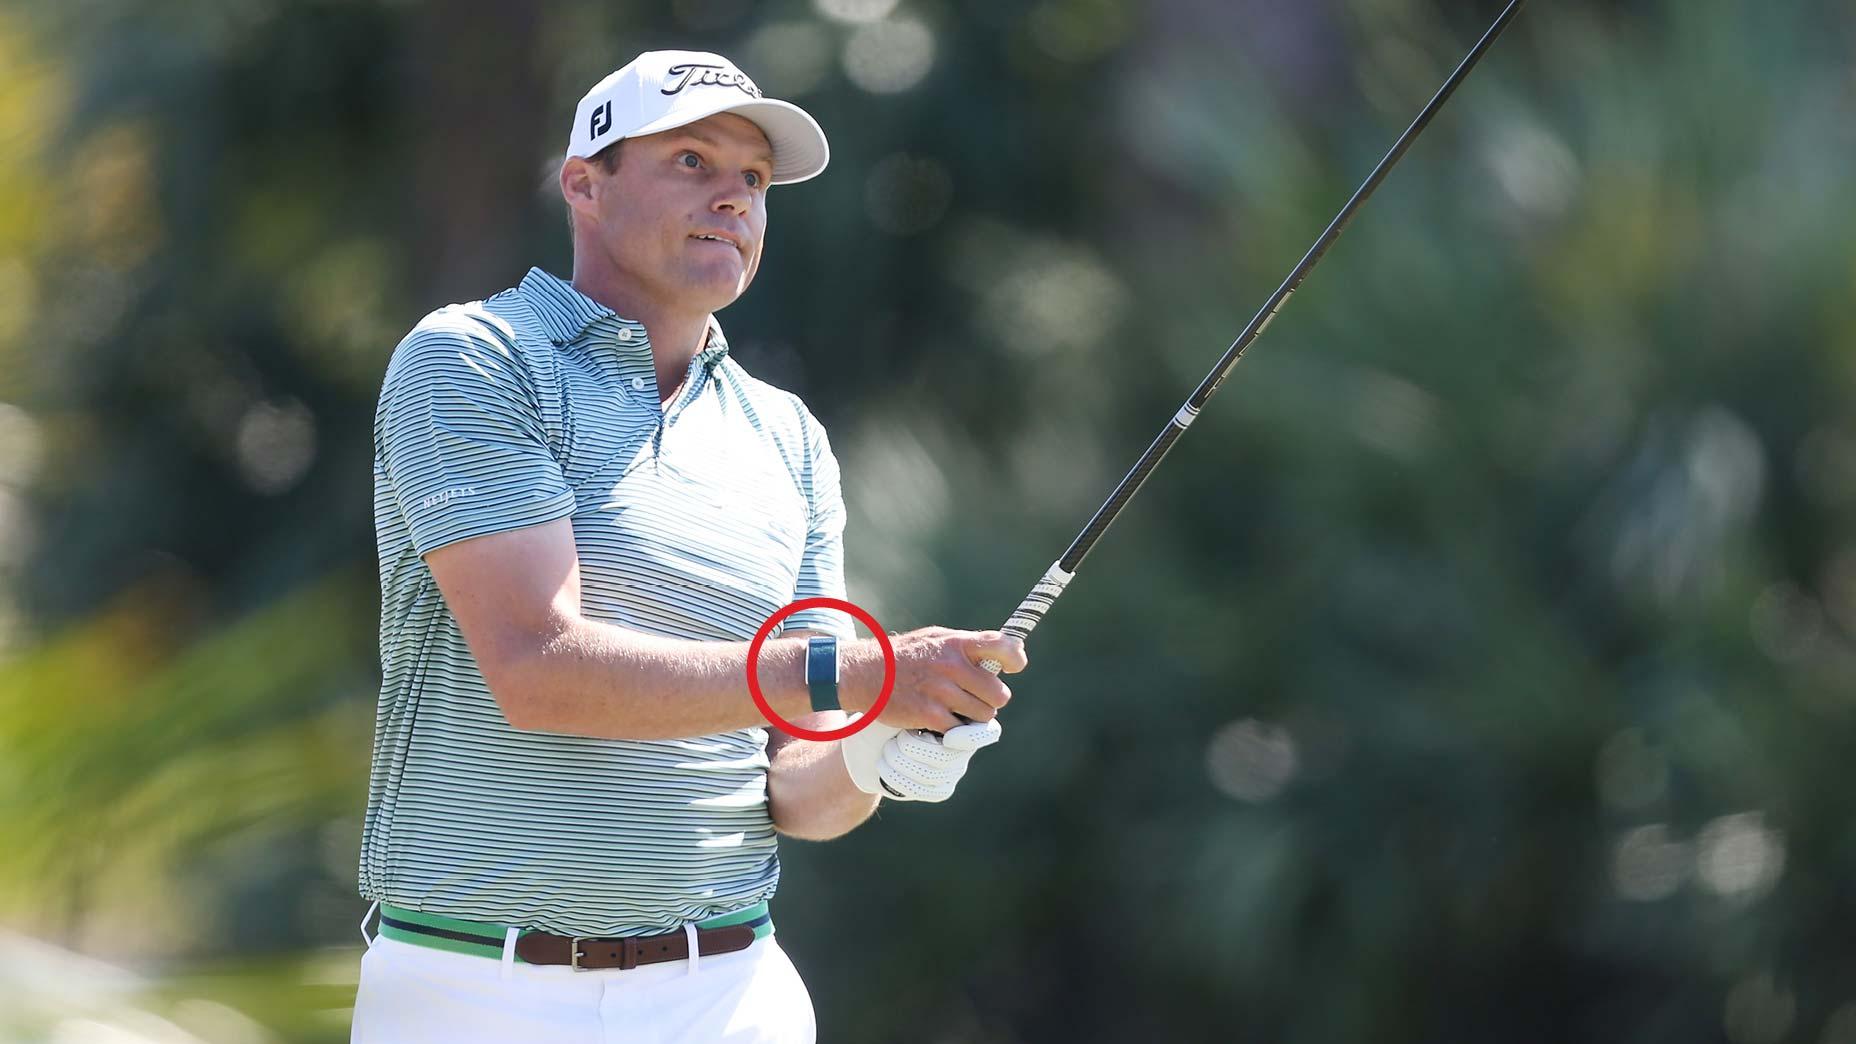 Nick Watney golfing wearing a Whoop wristband tracker